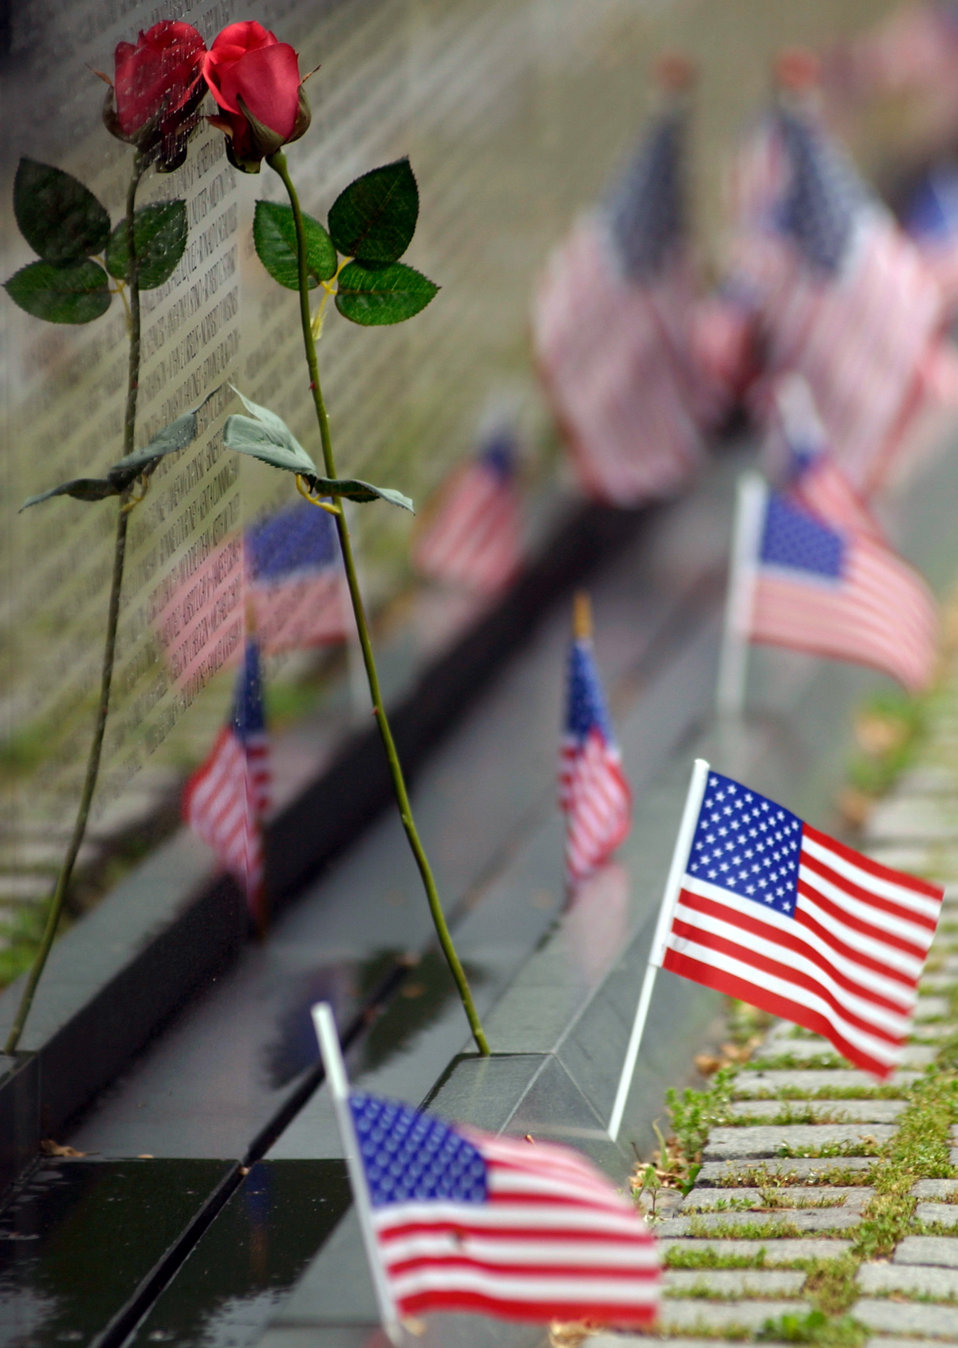 POWs, MIAs remembered